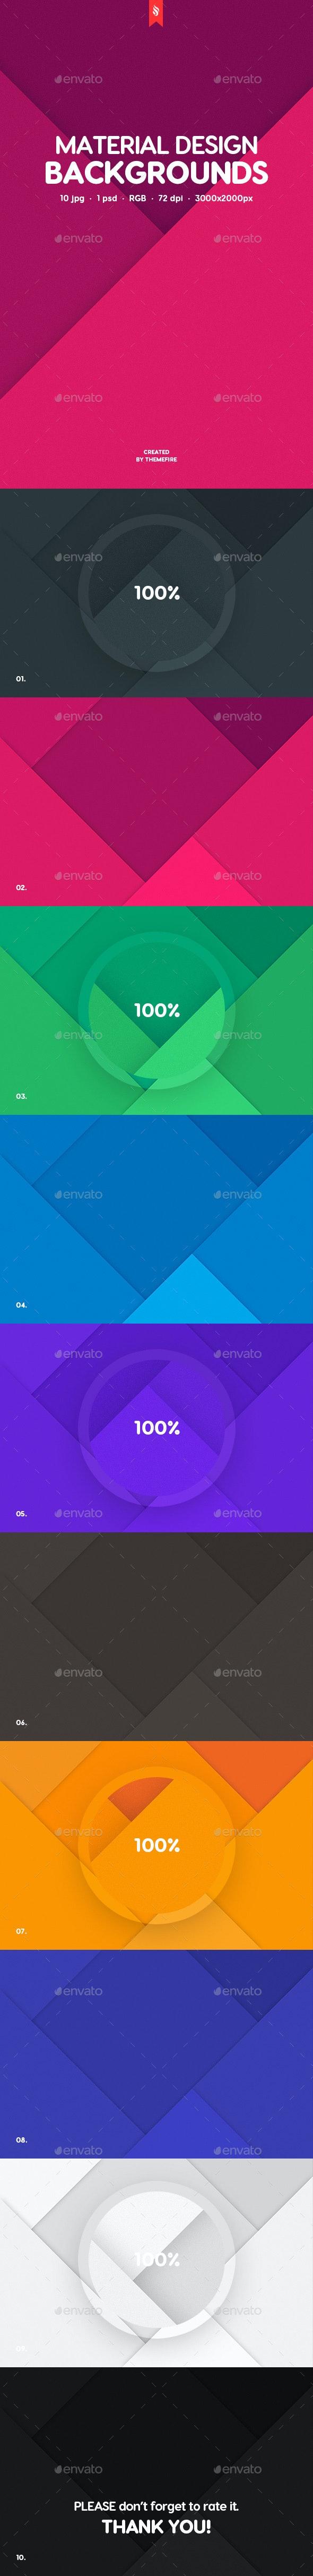 10 Material Design Backgrounds - Patterns Backgrounds